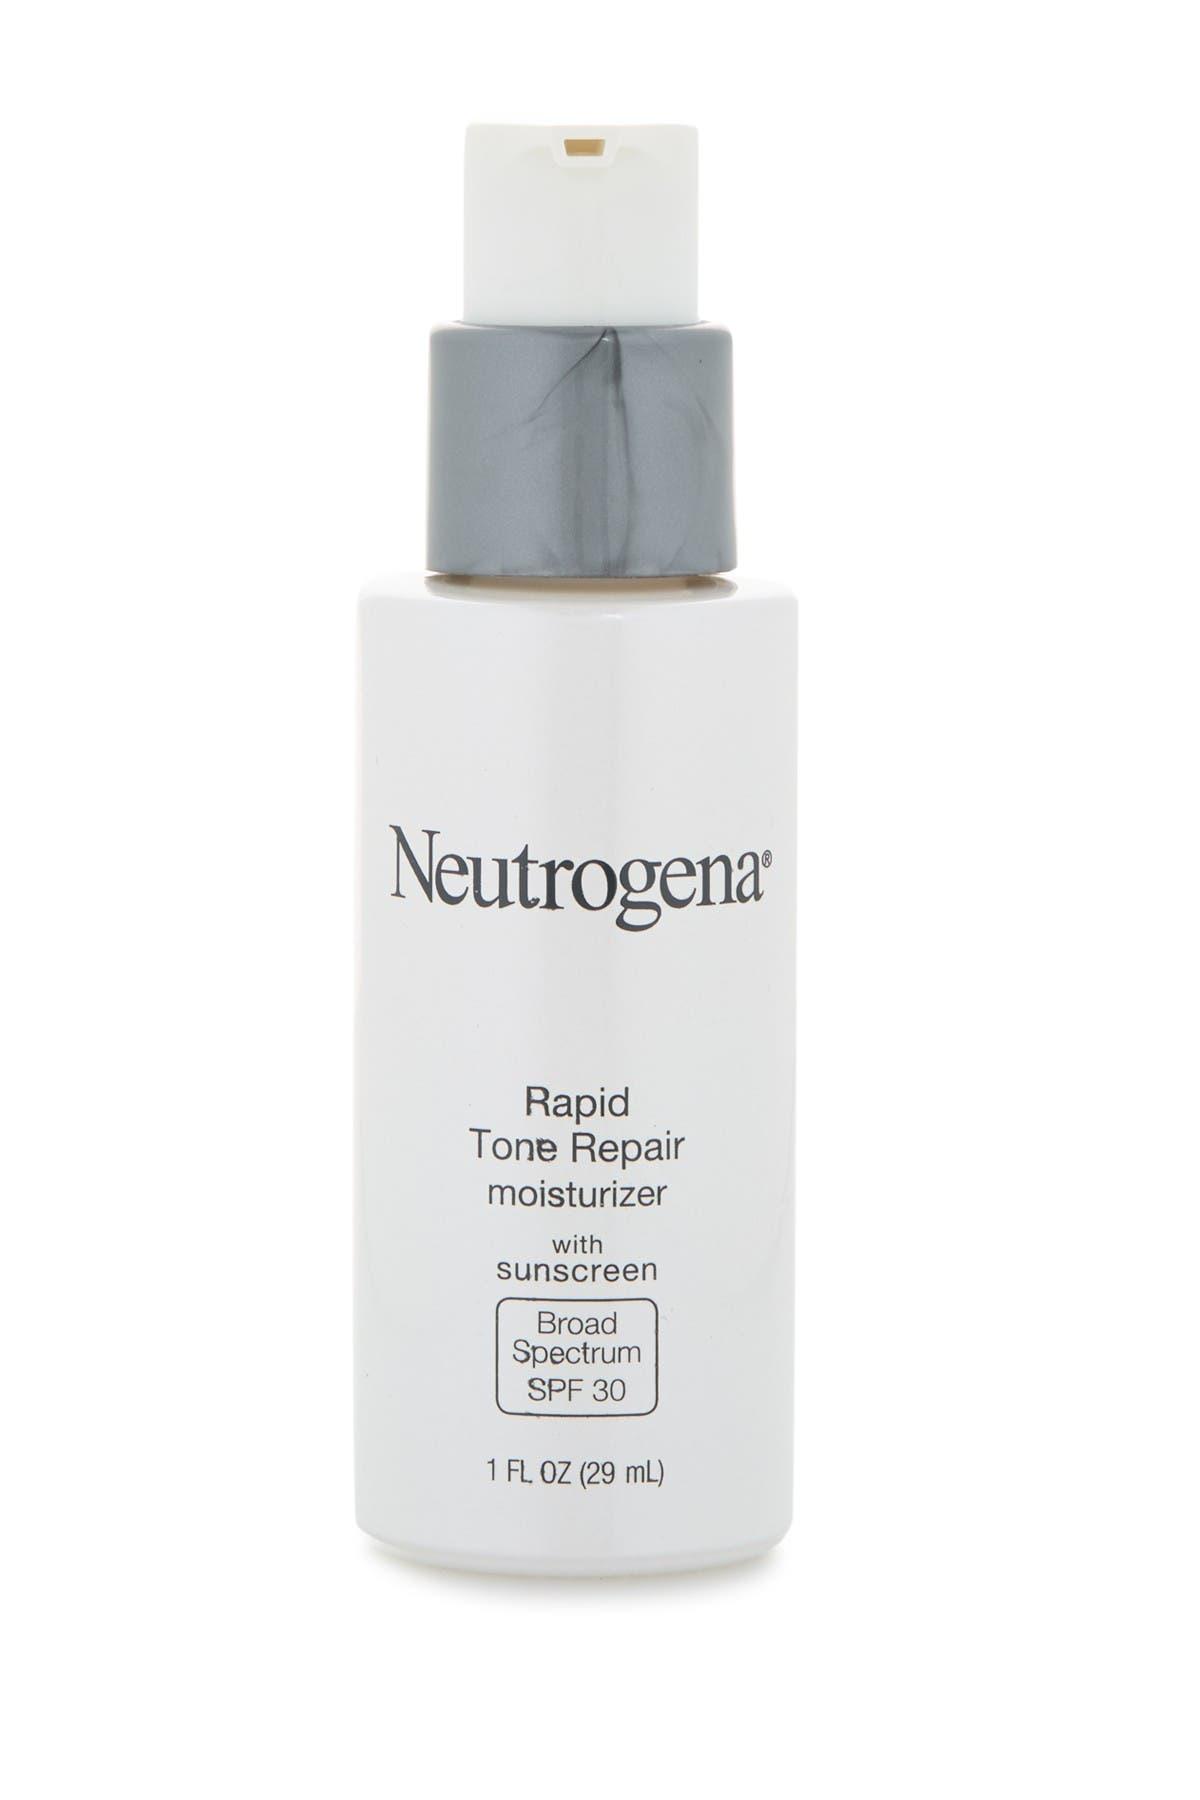 Image of Neutrogena Rapid Tone Retinol Moisturizer, SPF 30, Vitamin C - 1 fl. oz.